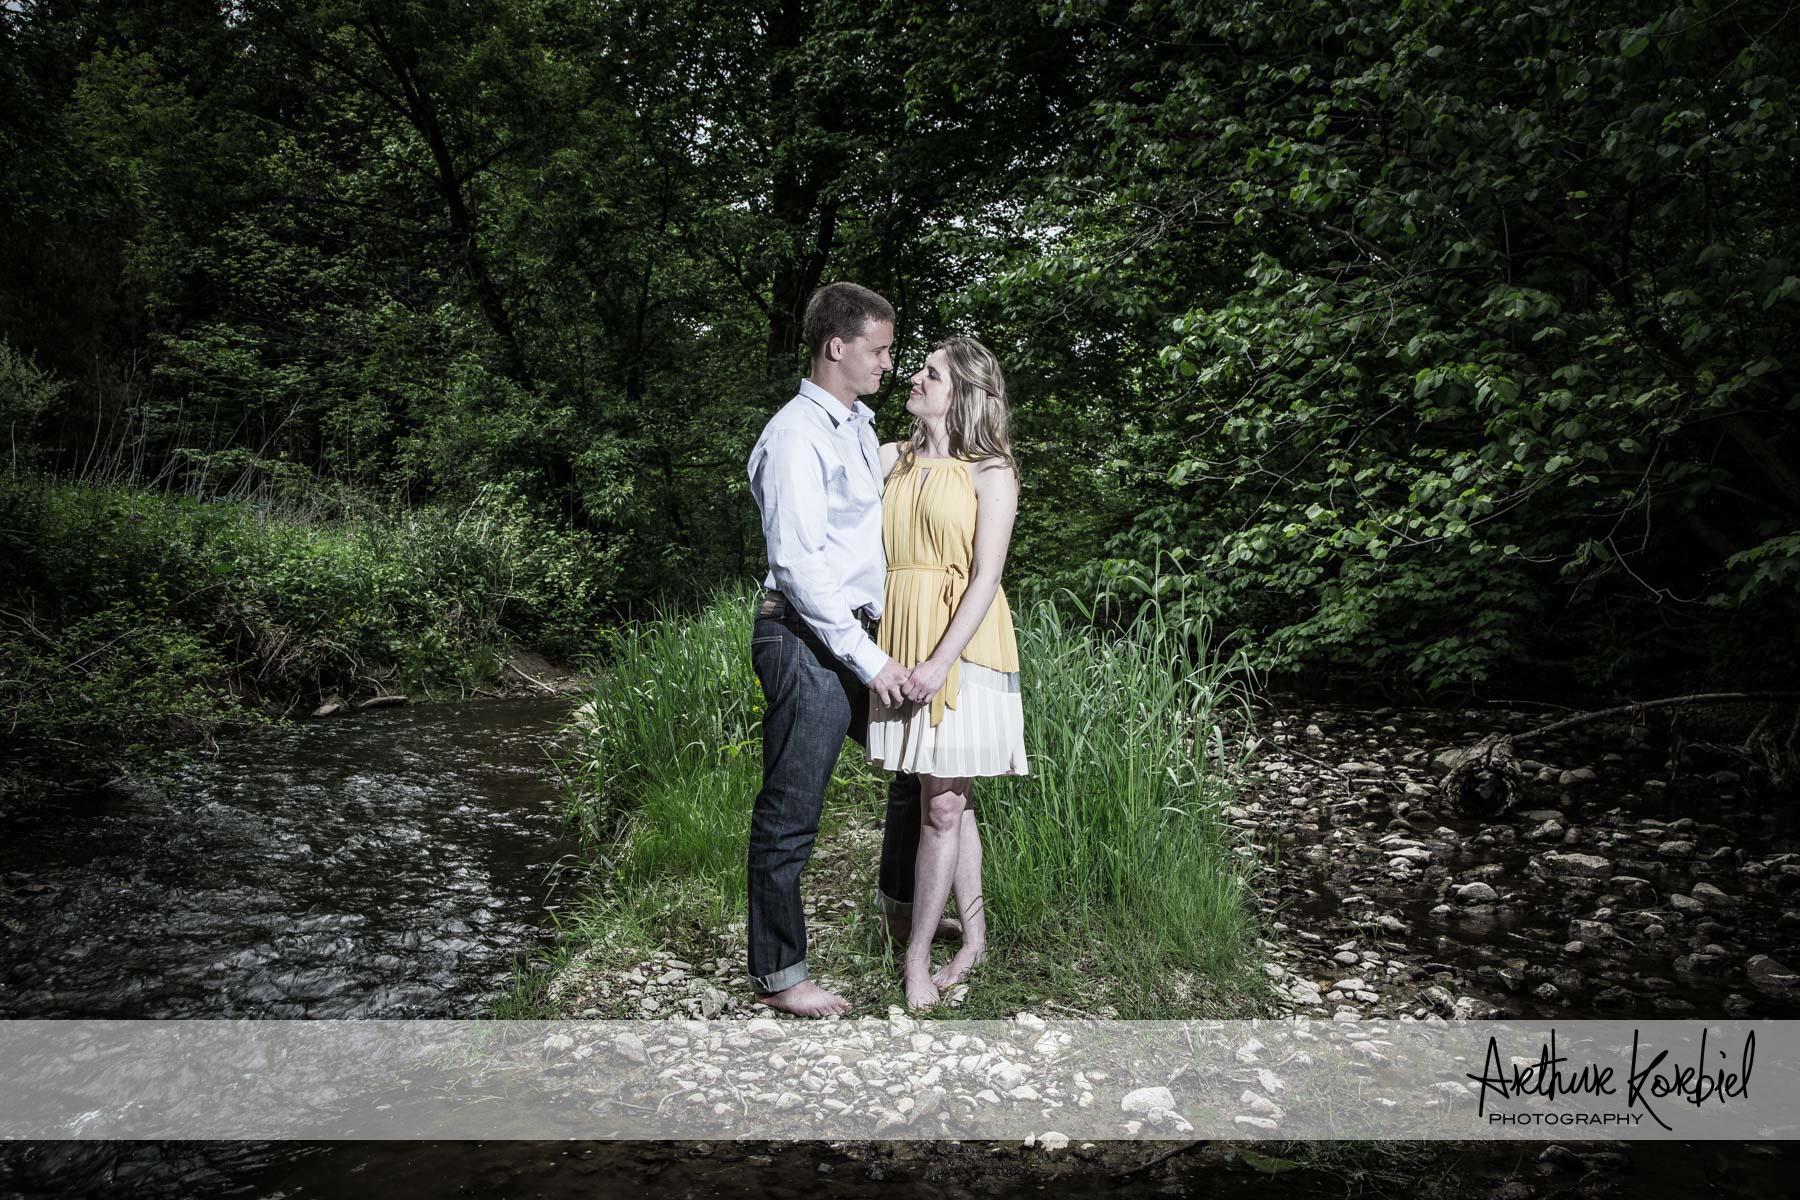 Arthur Korbiel Photography - London Engagement Photographer-022.jpg